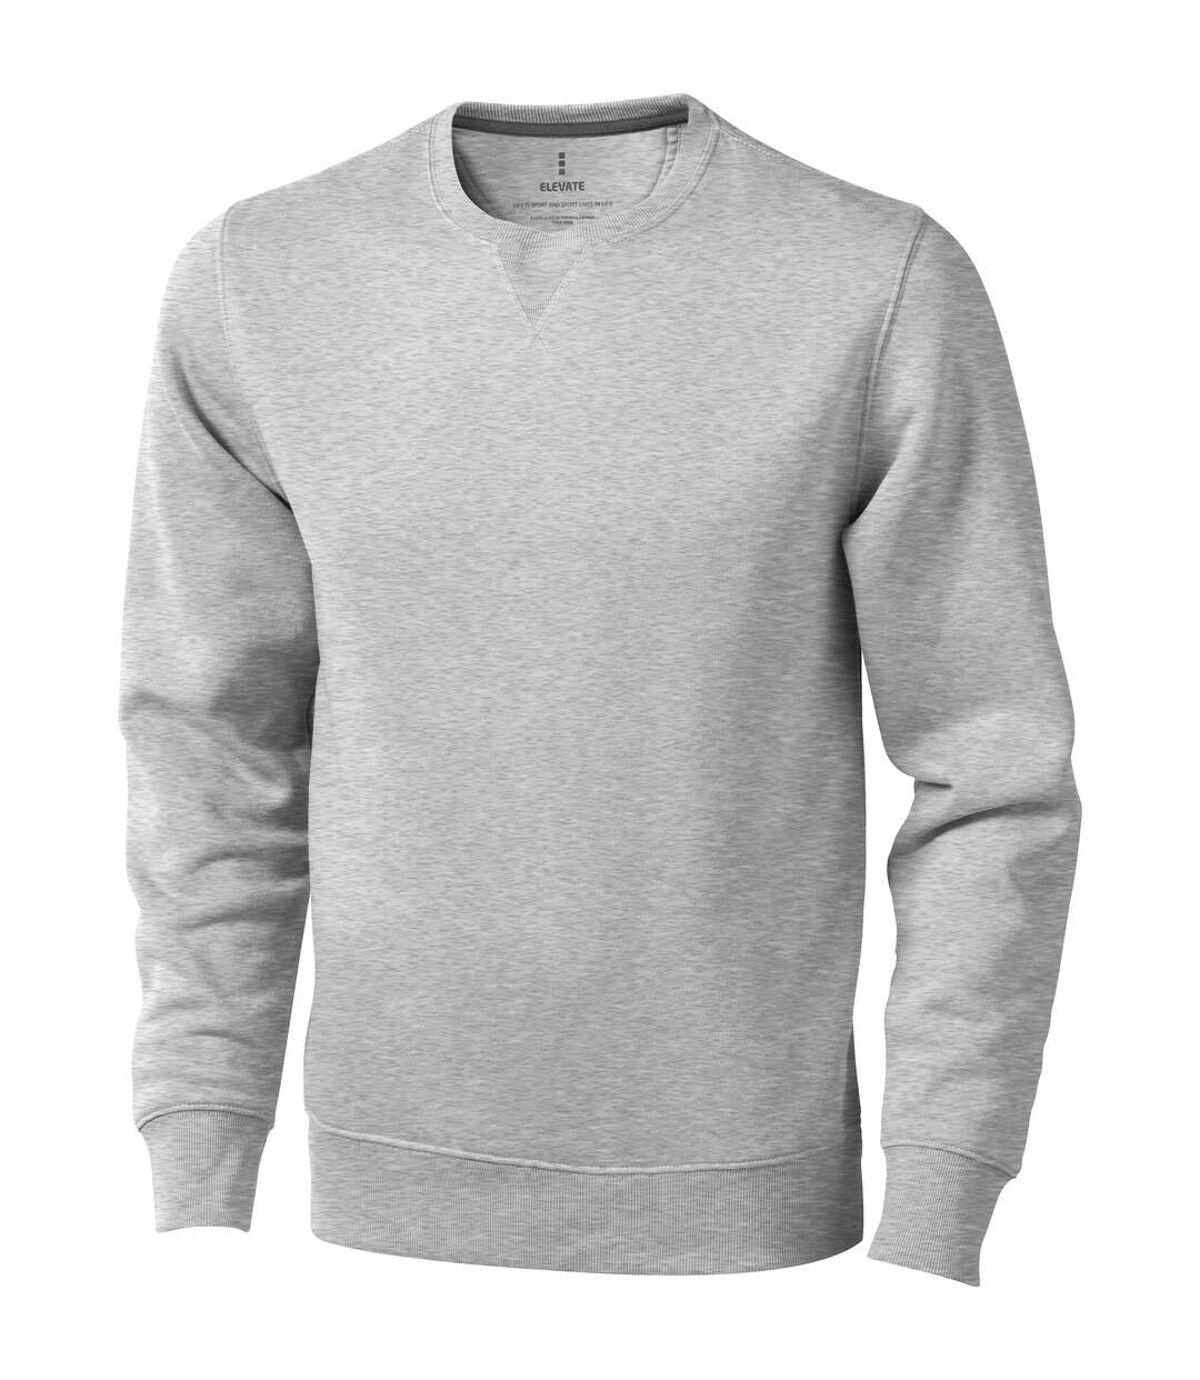 Elevate Mens Surrey Crew Neck Sweater (Grey Melange) - UTPF1849